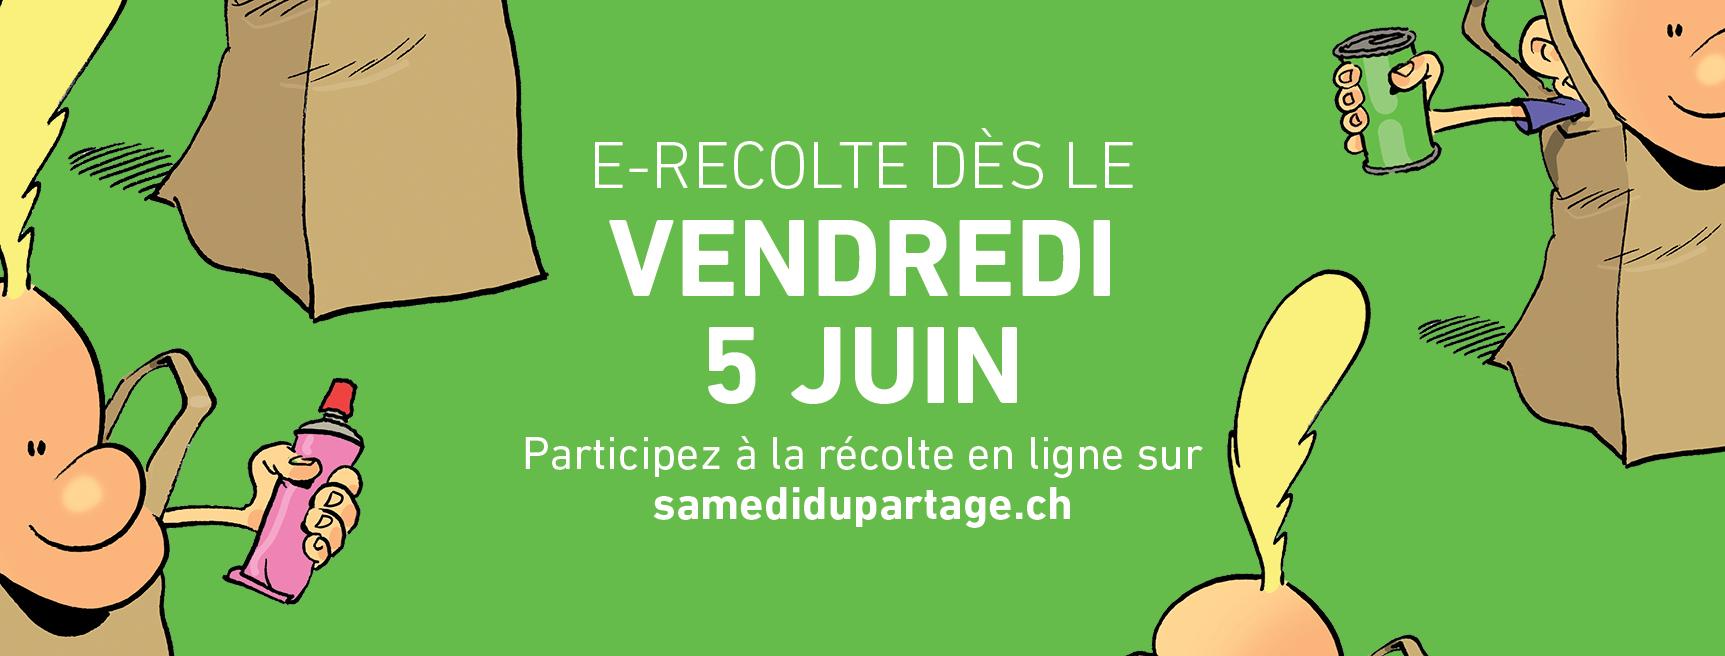 samedi du partage e-recolte 2020